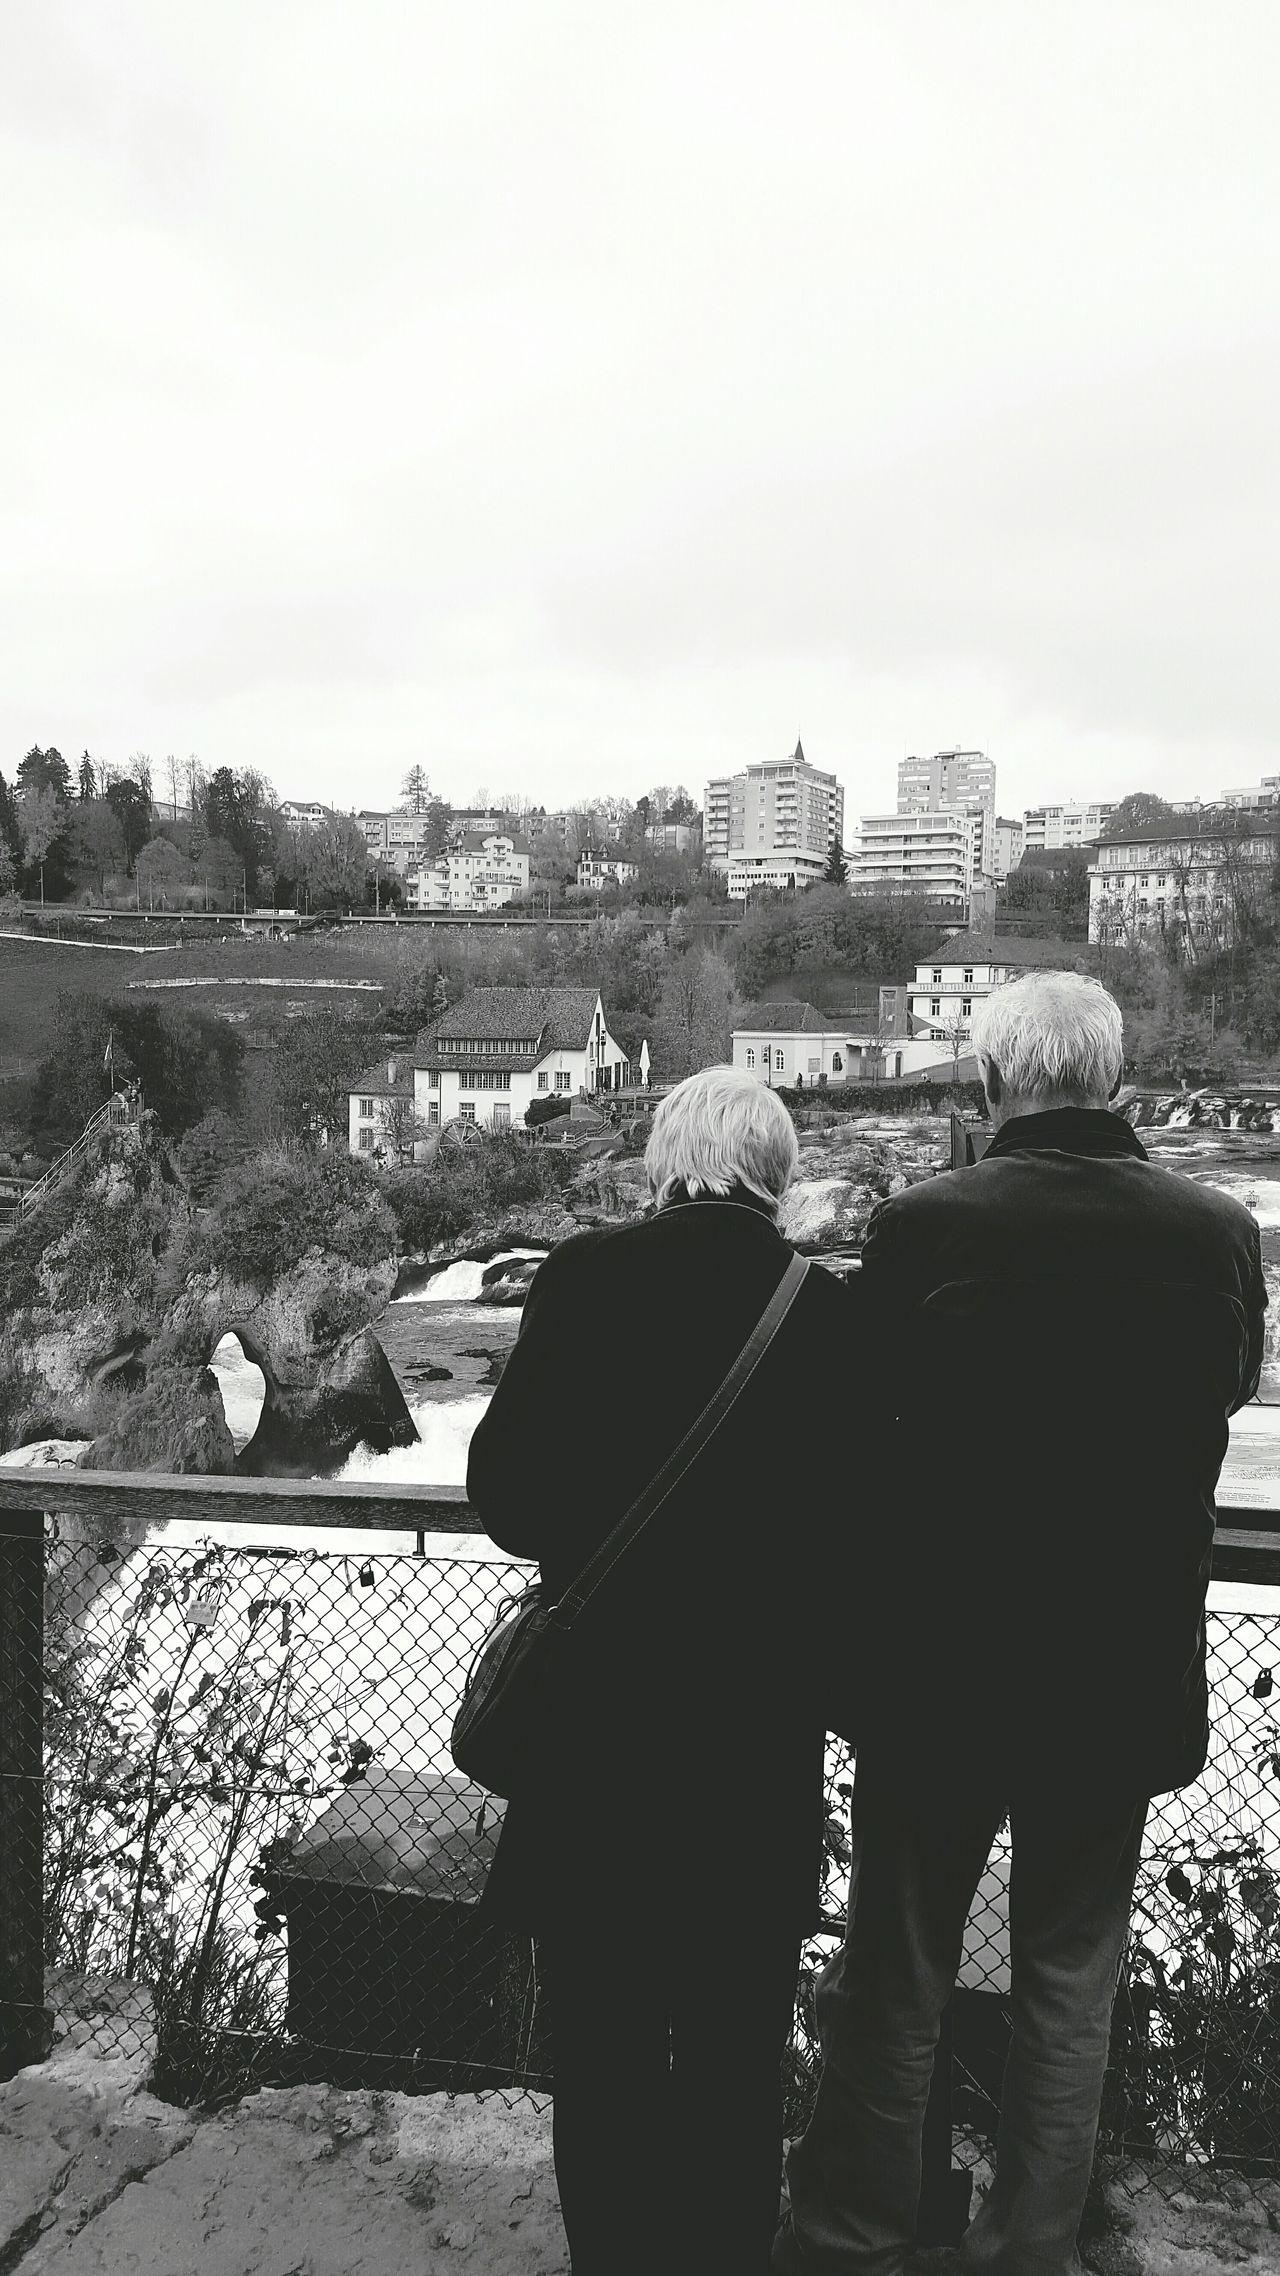 Scenic Couple Schweizerin People Watching Landscape Blackandwhite